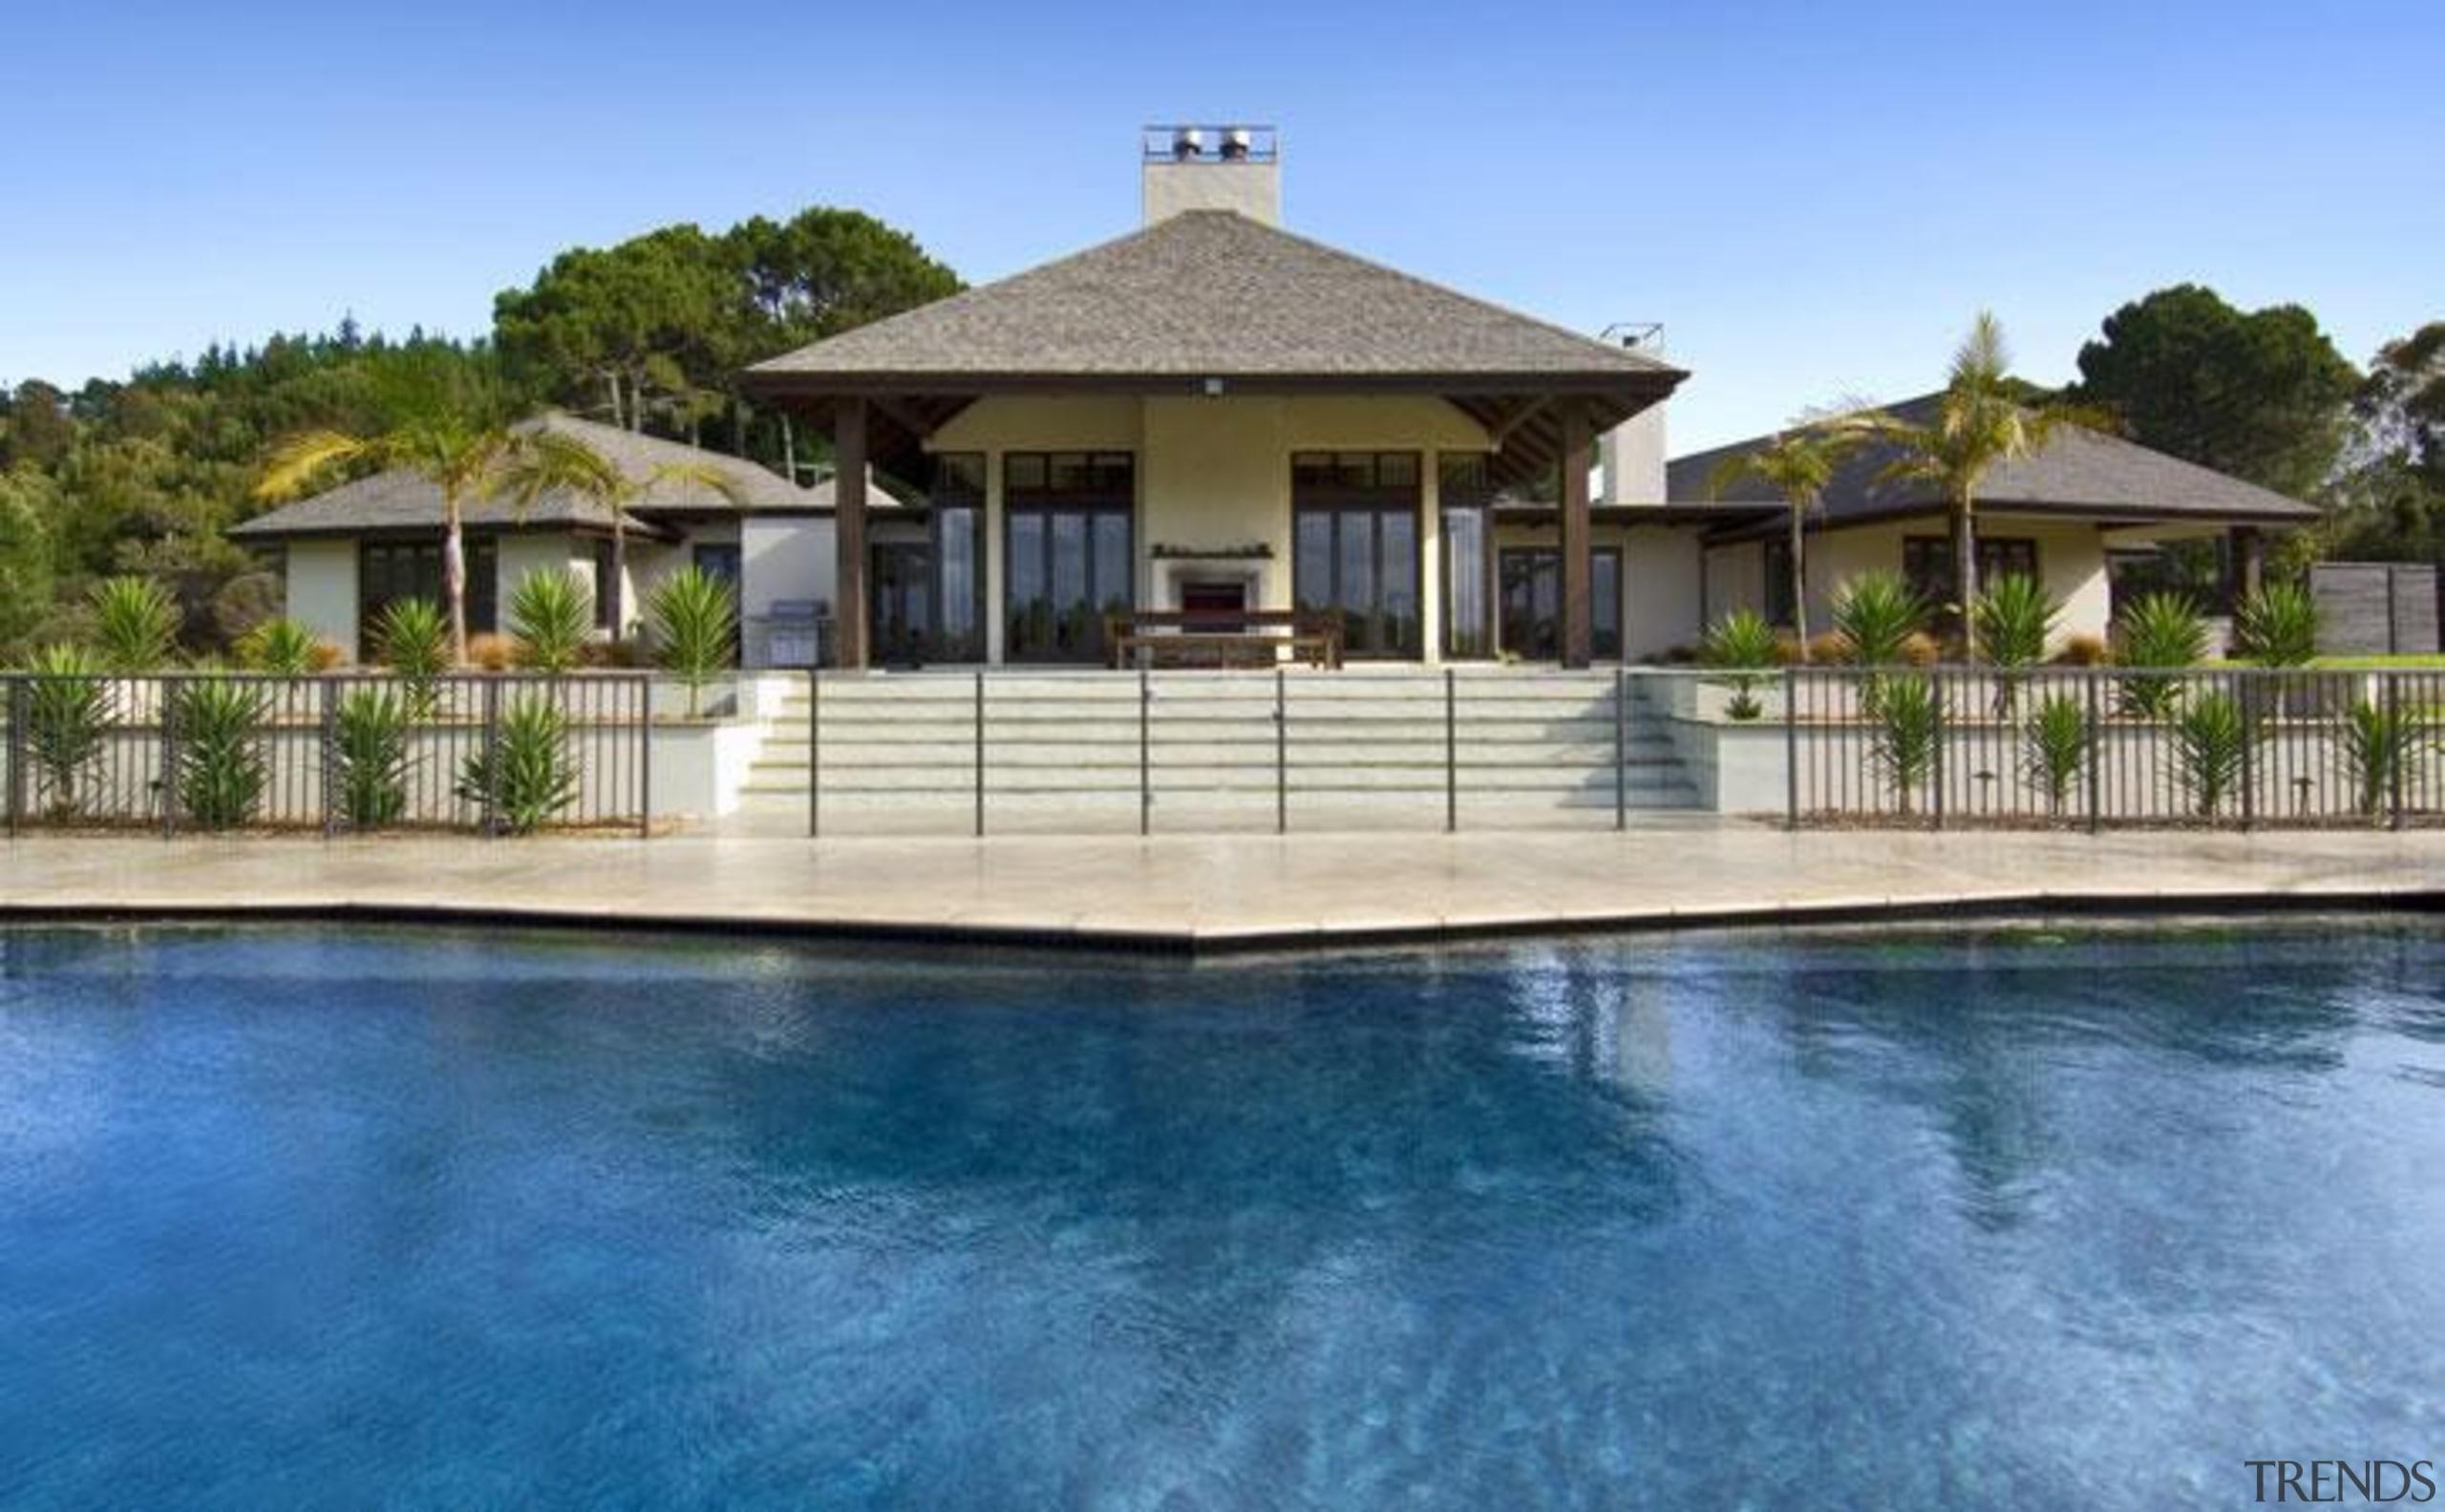 pol0002web.jpg - pol0002web.jpg - cottage | estate | cottage, estate, facade, home, house, leisure, mansion, outdoor structure, property, real estate, resort, swimming pool, villa, teal